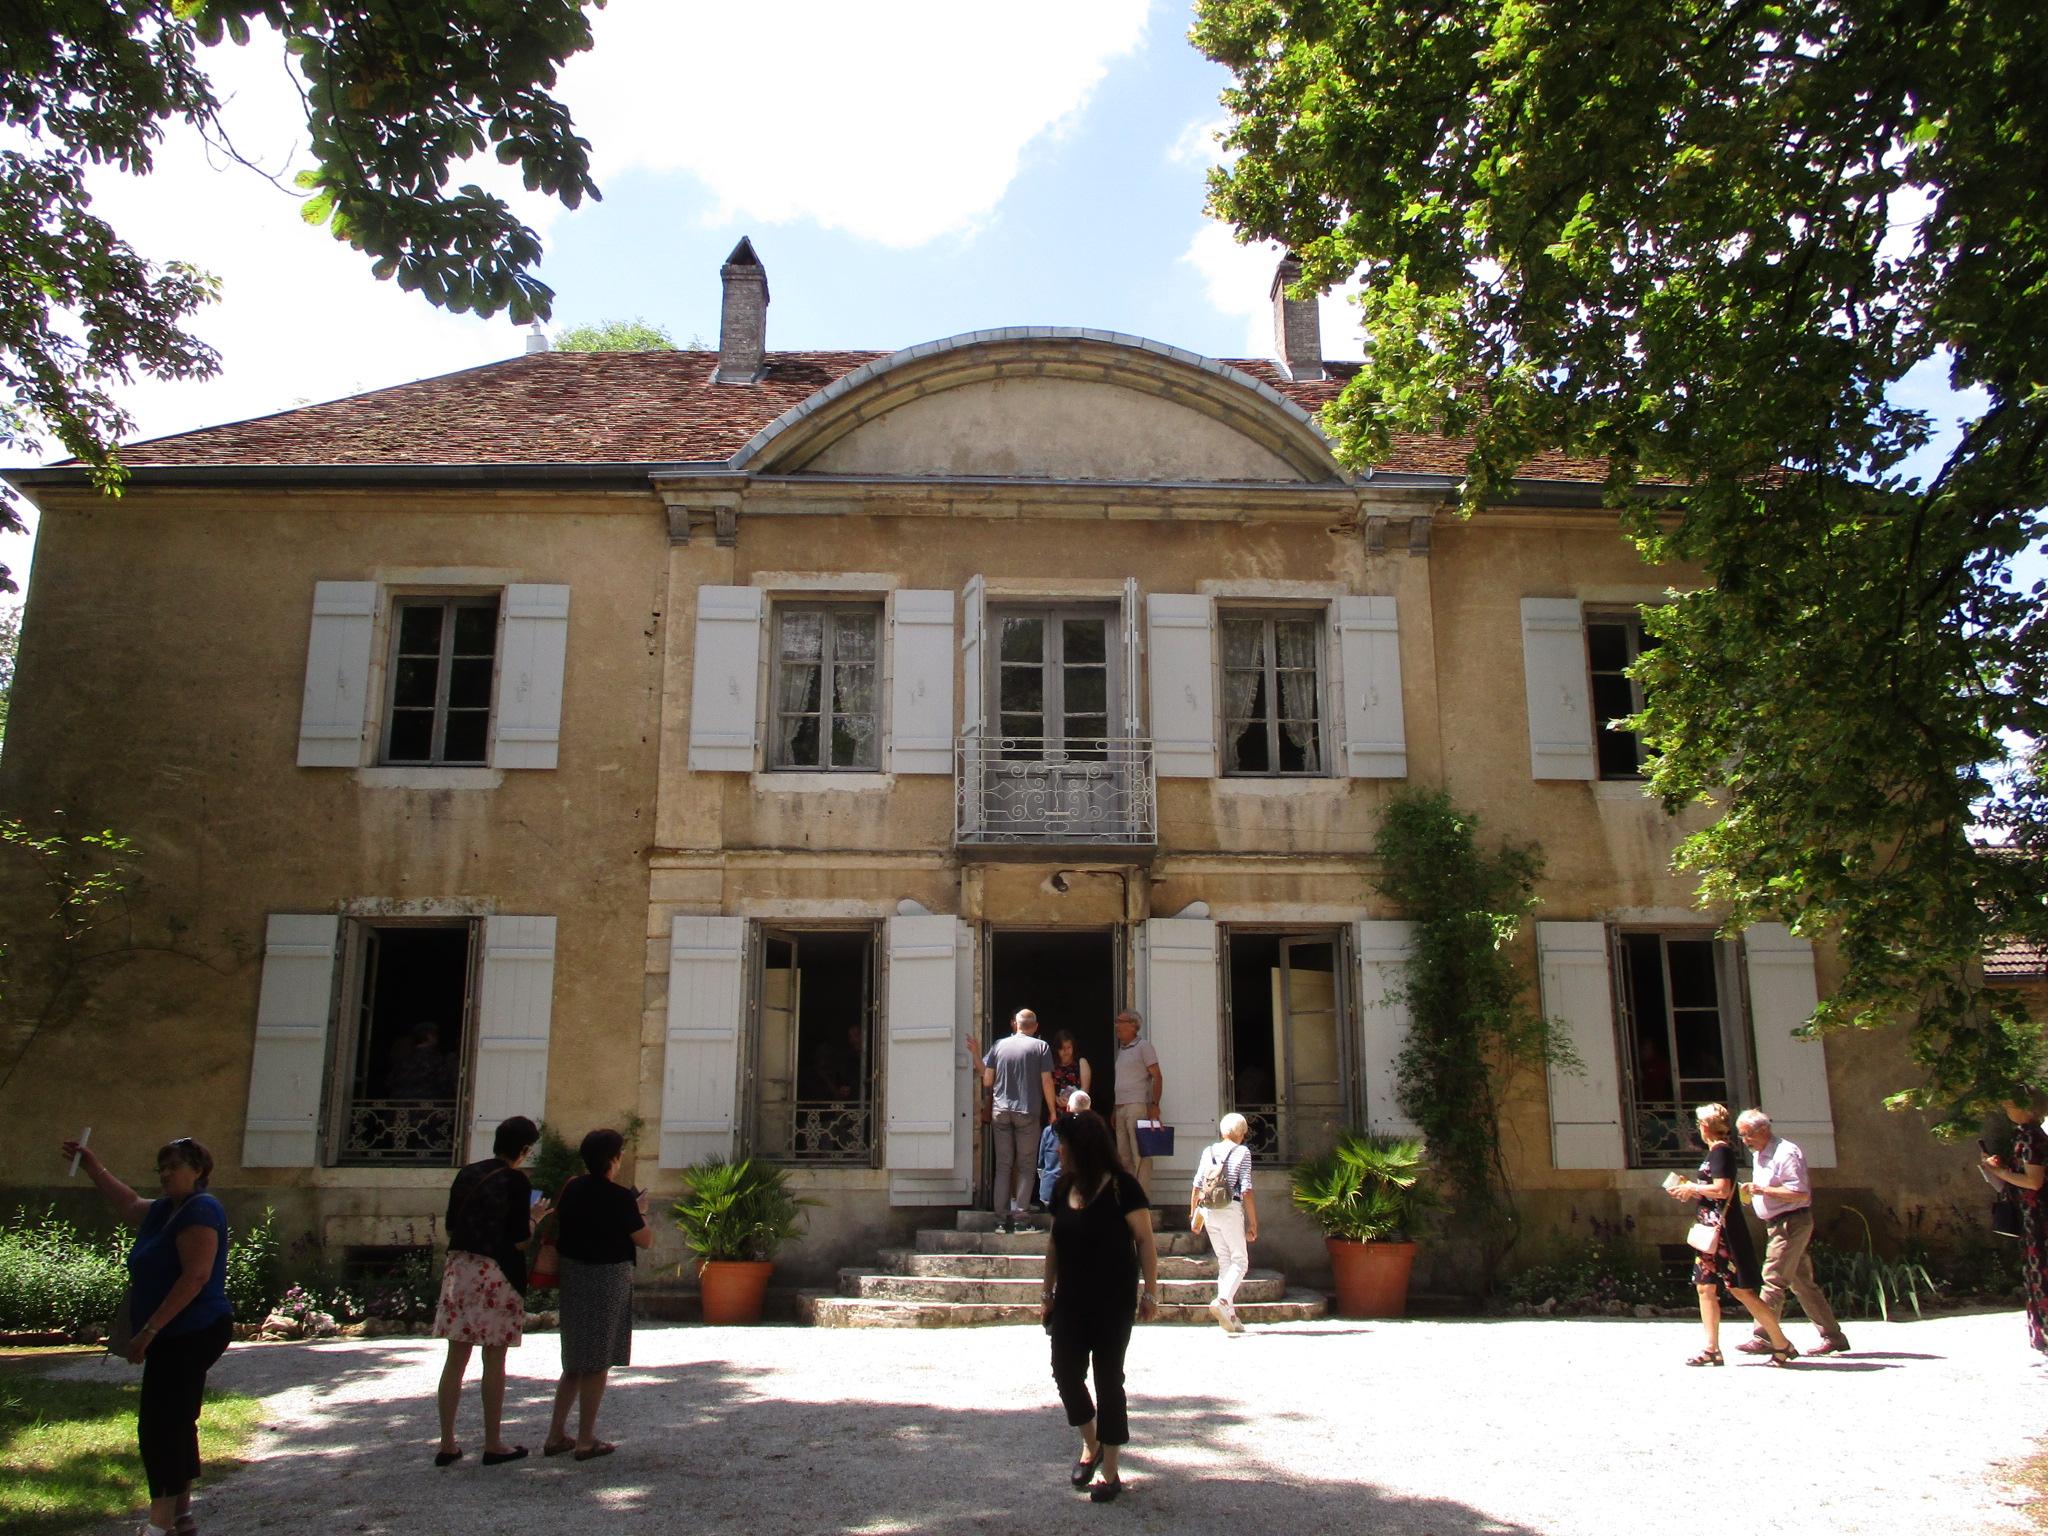 File:Maison Colette Besançon 9.jpg - Wikimedia Commons